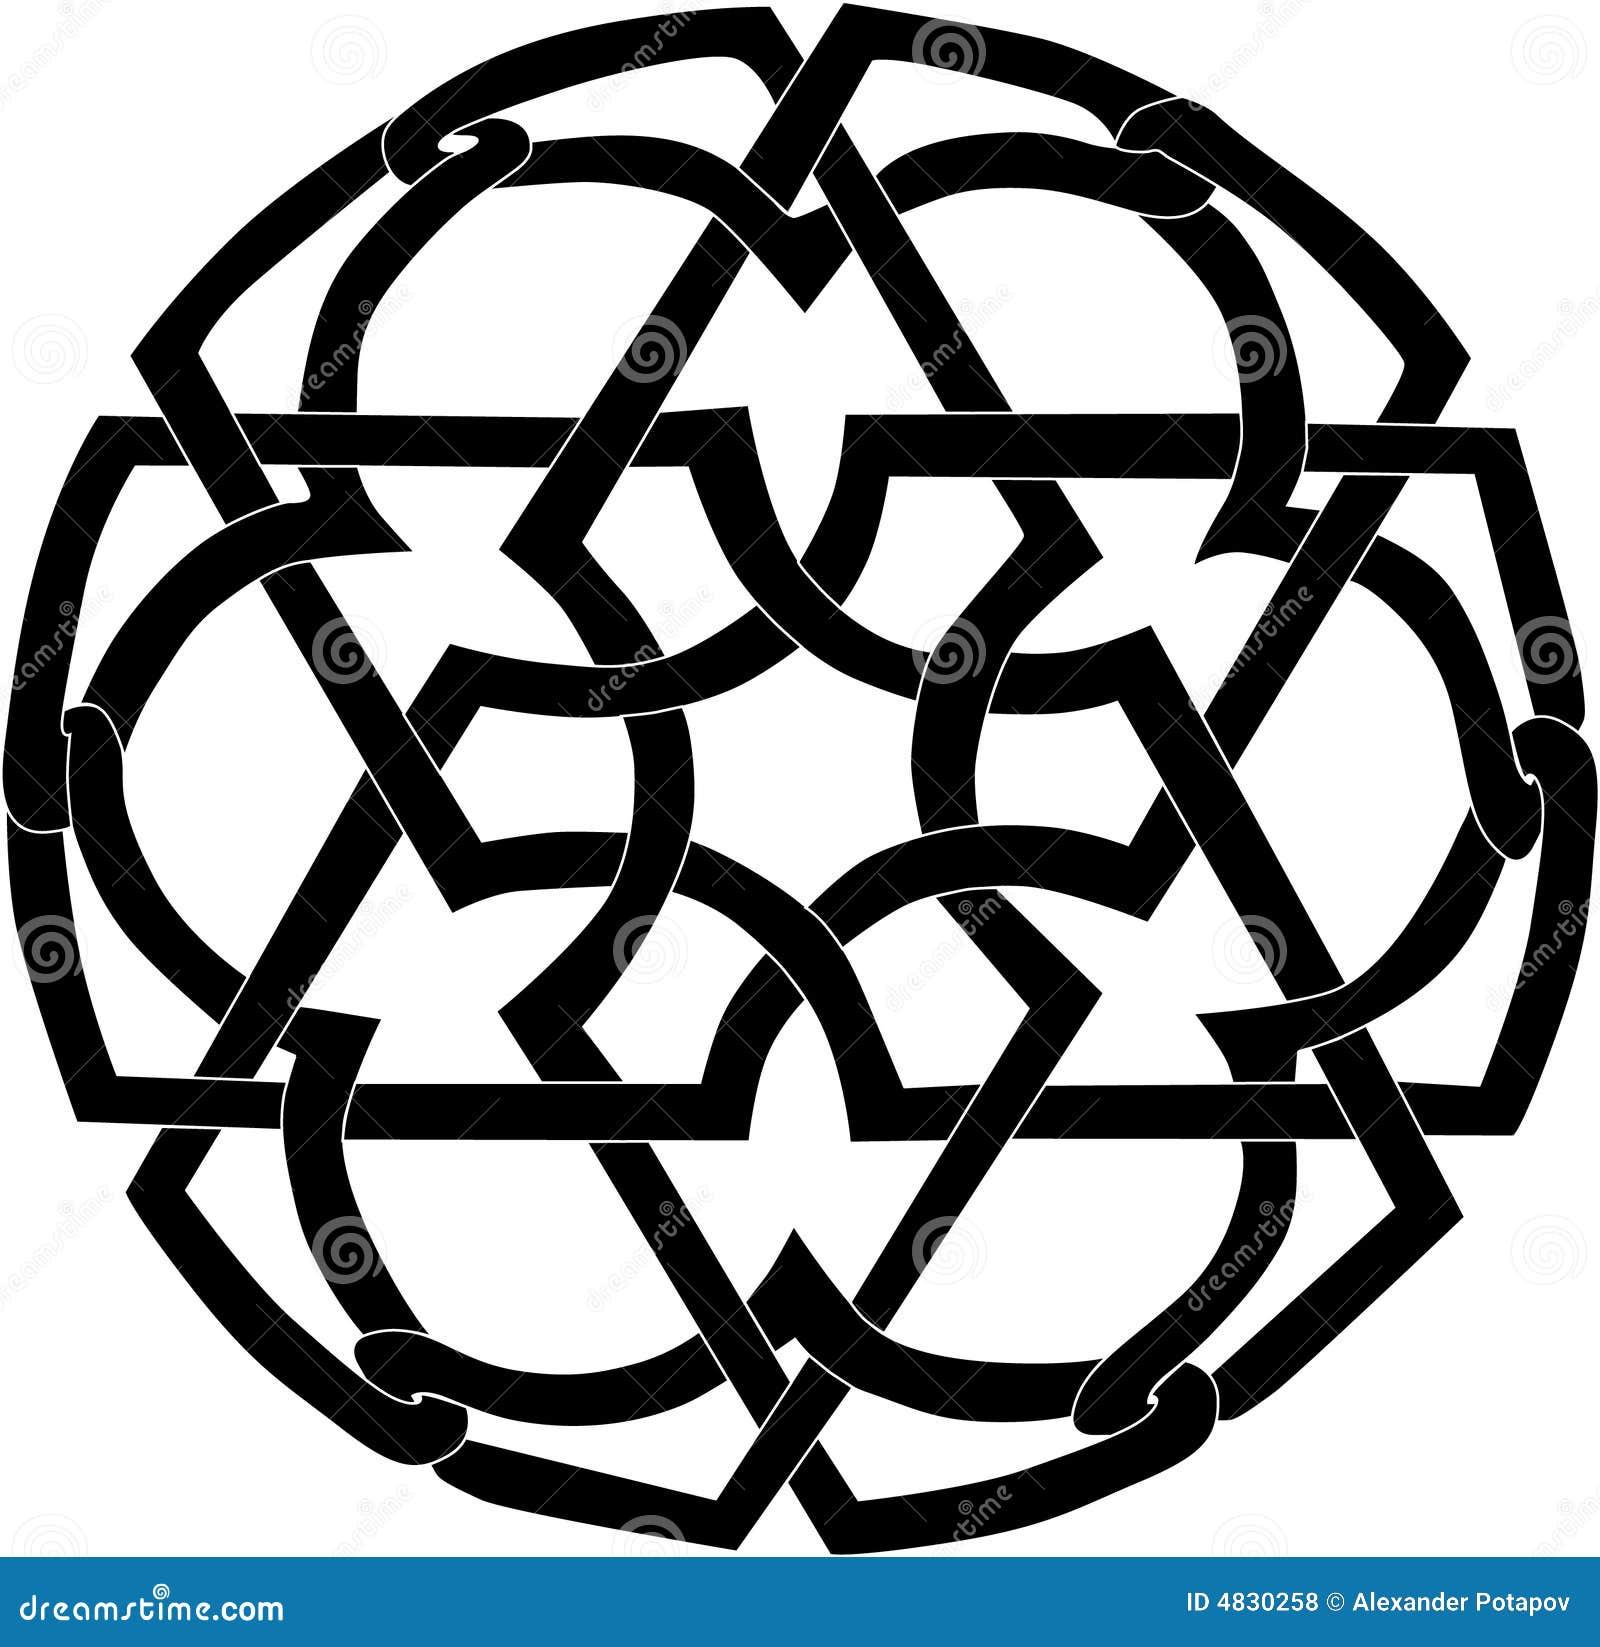 Zwarte ronde decoratie